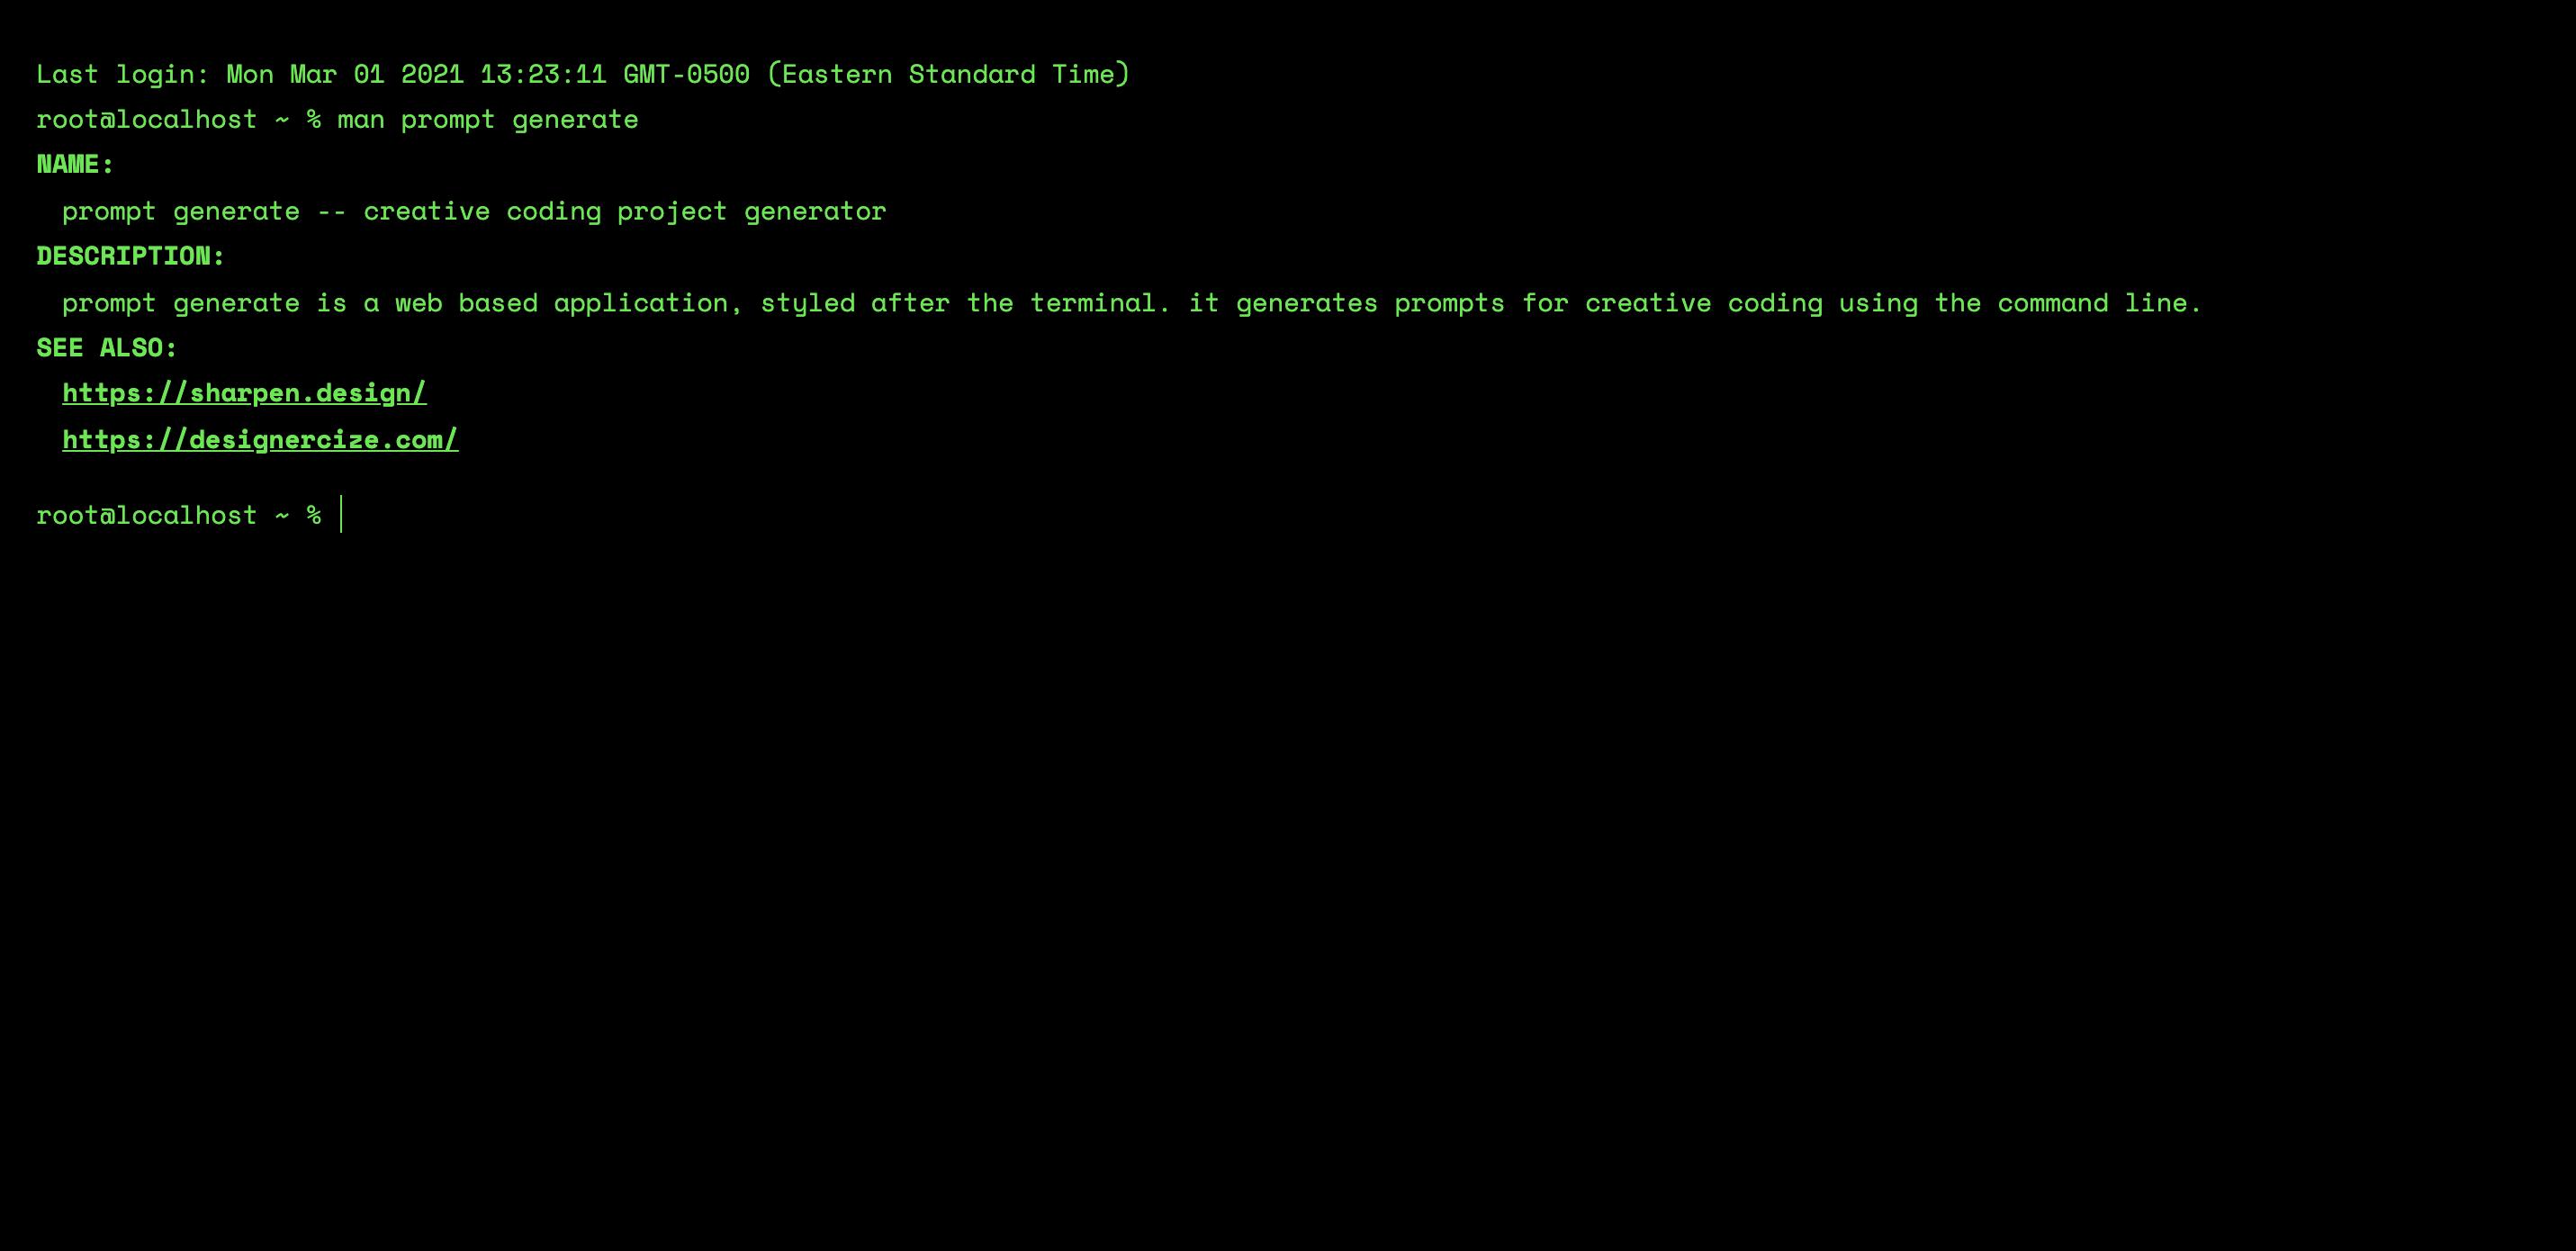 Screenshot of the prompt generator, looking very similar to the Mac terminal